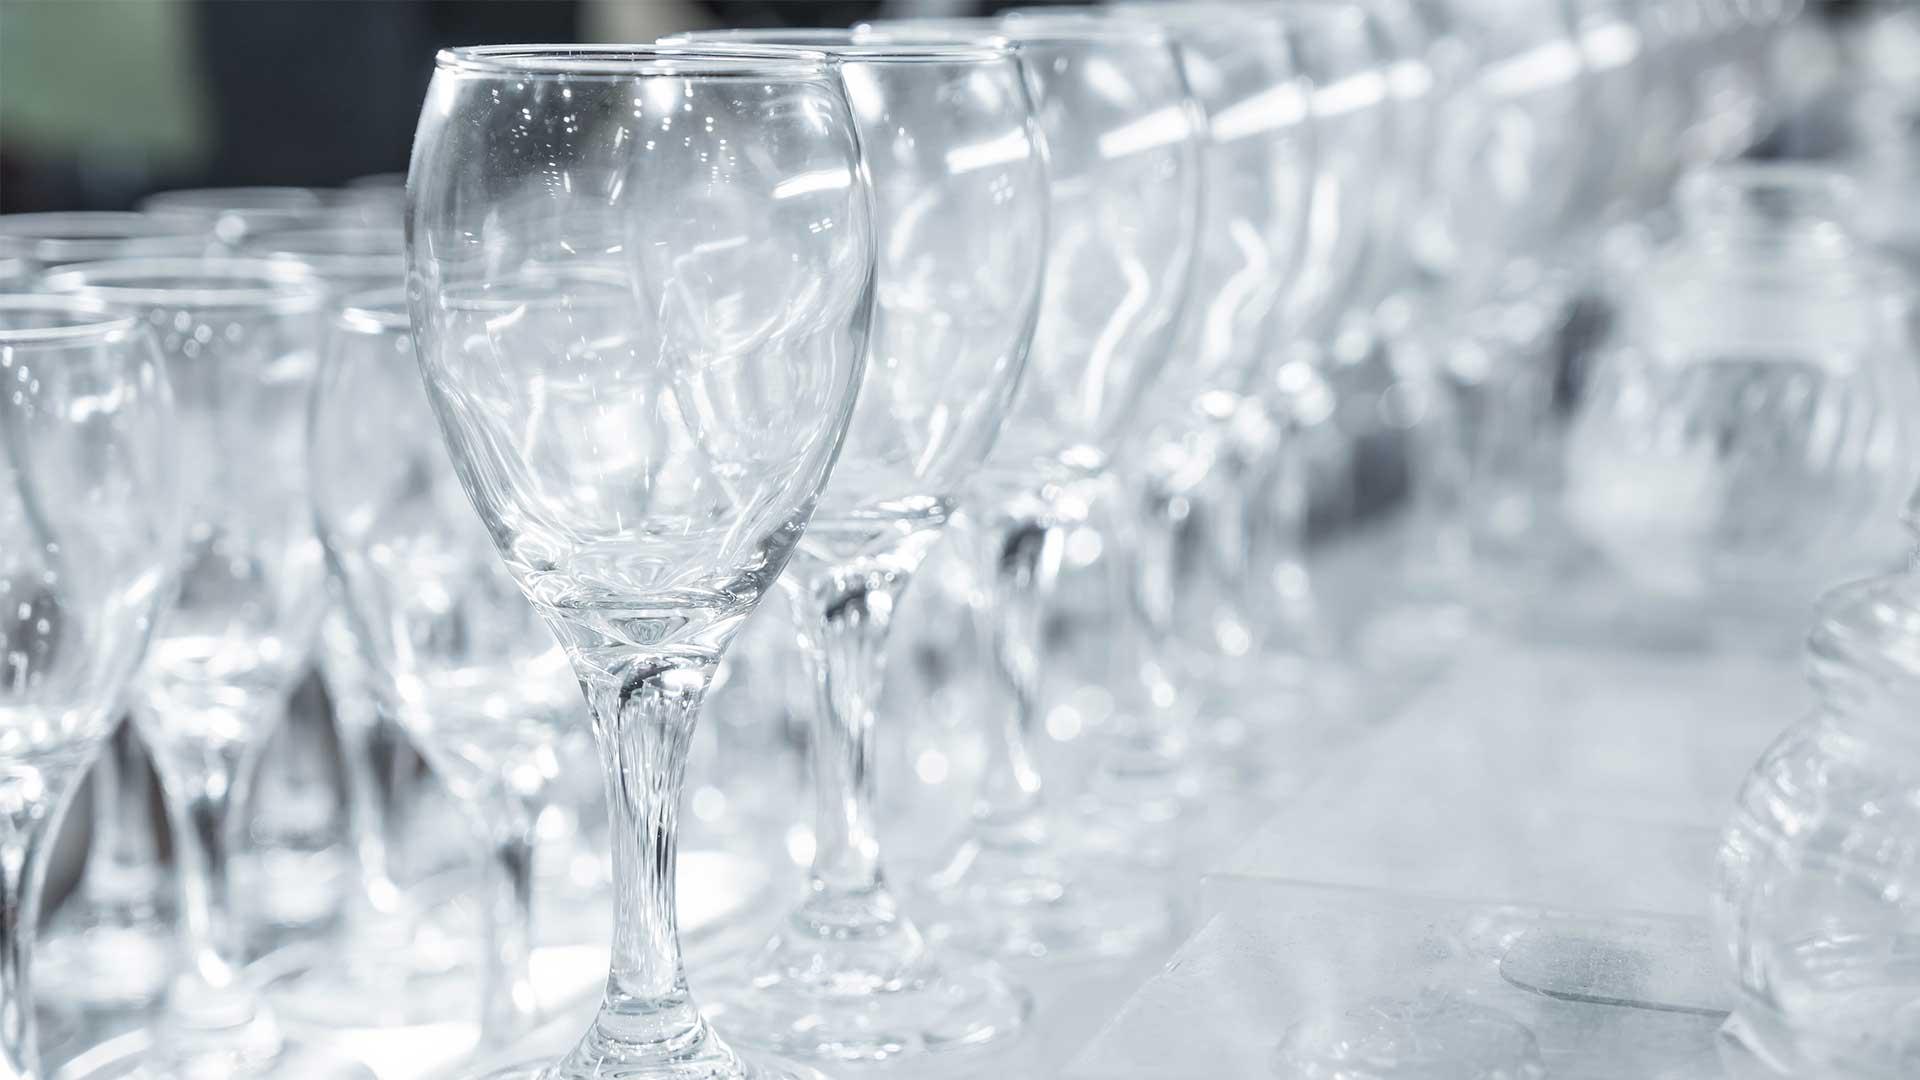 Borosilicate glass is better